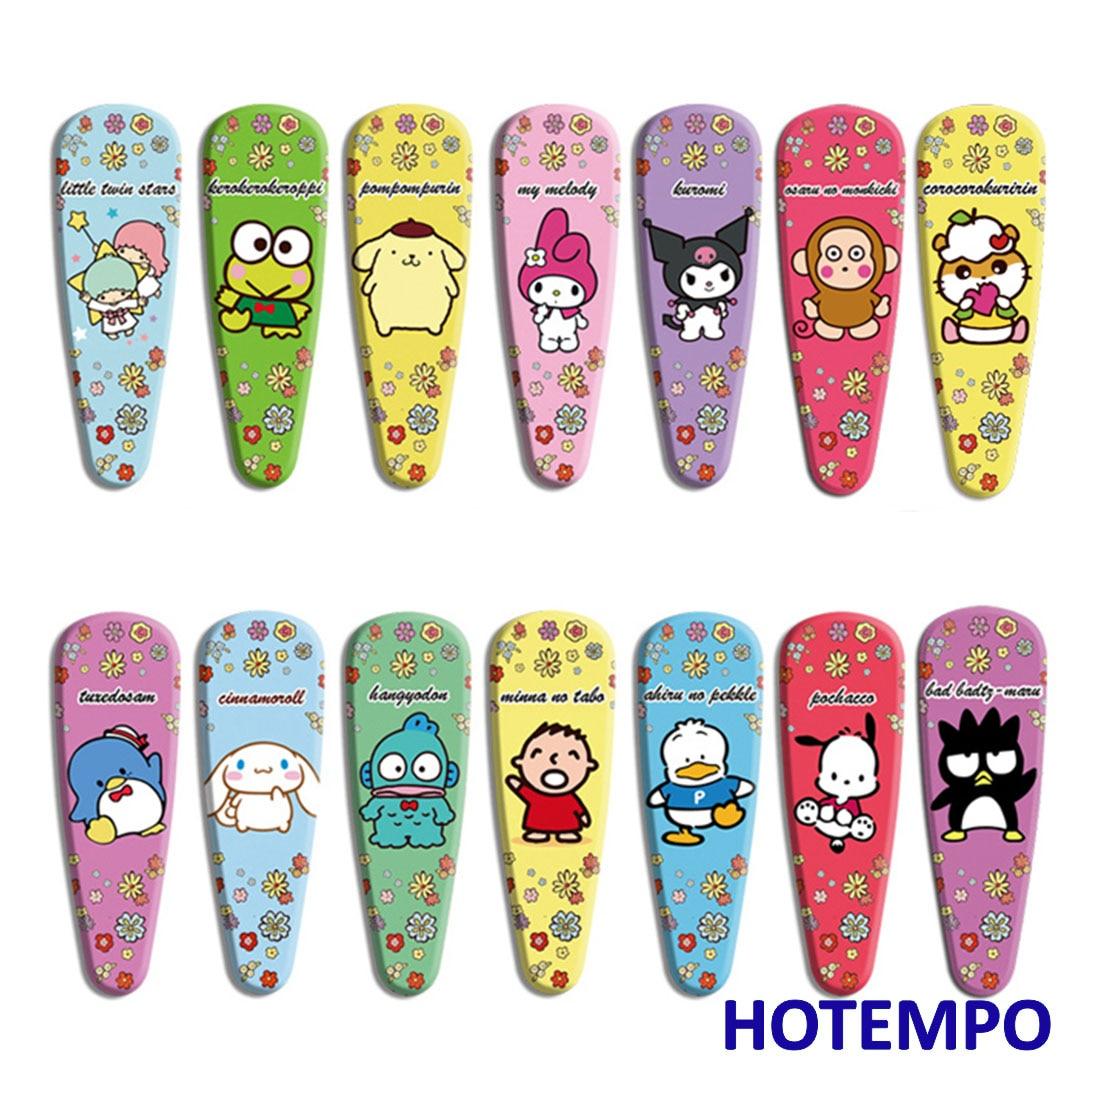 Cute Cartoon Cinnamoroll Pochacco Melody Kuromi Keroppi Sam Maru TwinStars Pekkle Tabo Kawaii Hairpins HairClips For Kids Gift